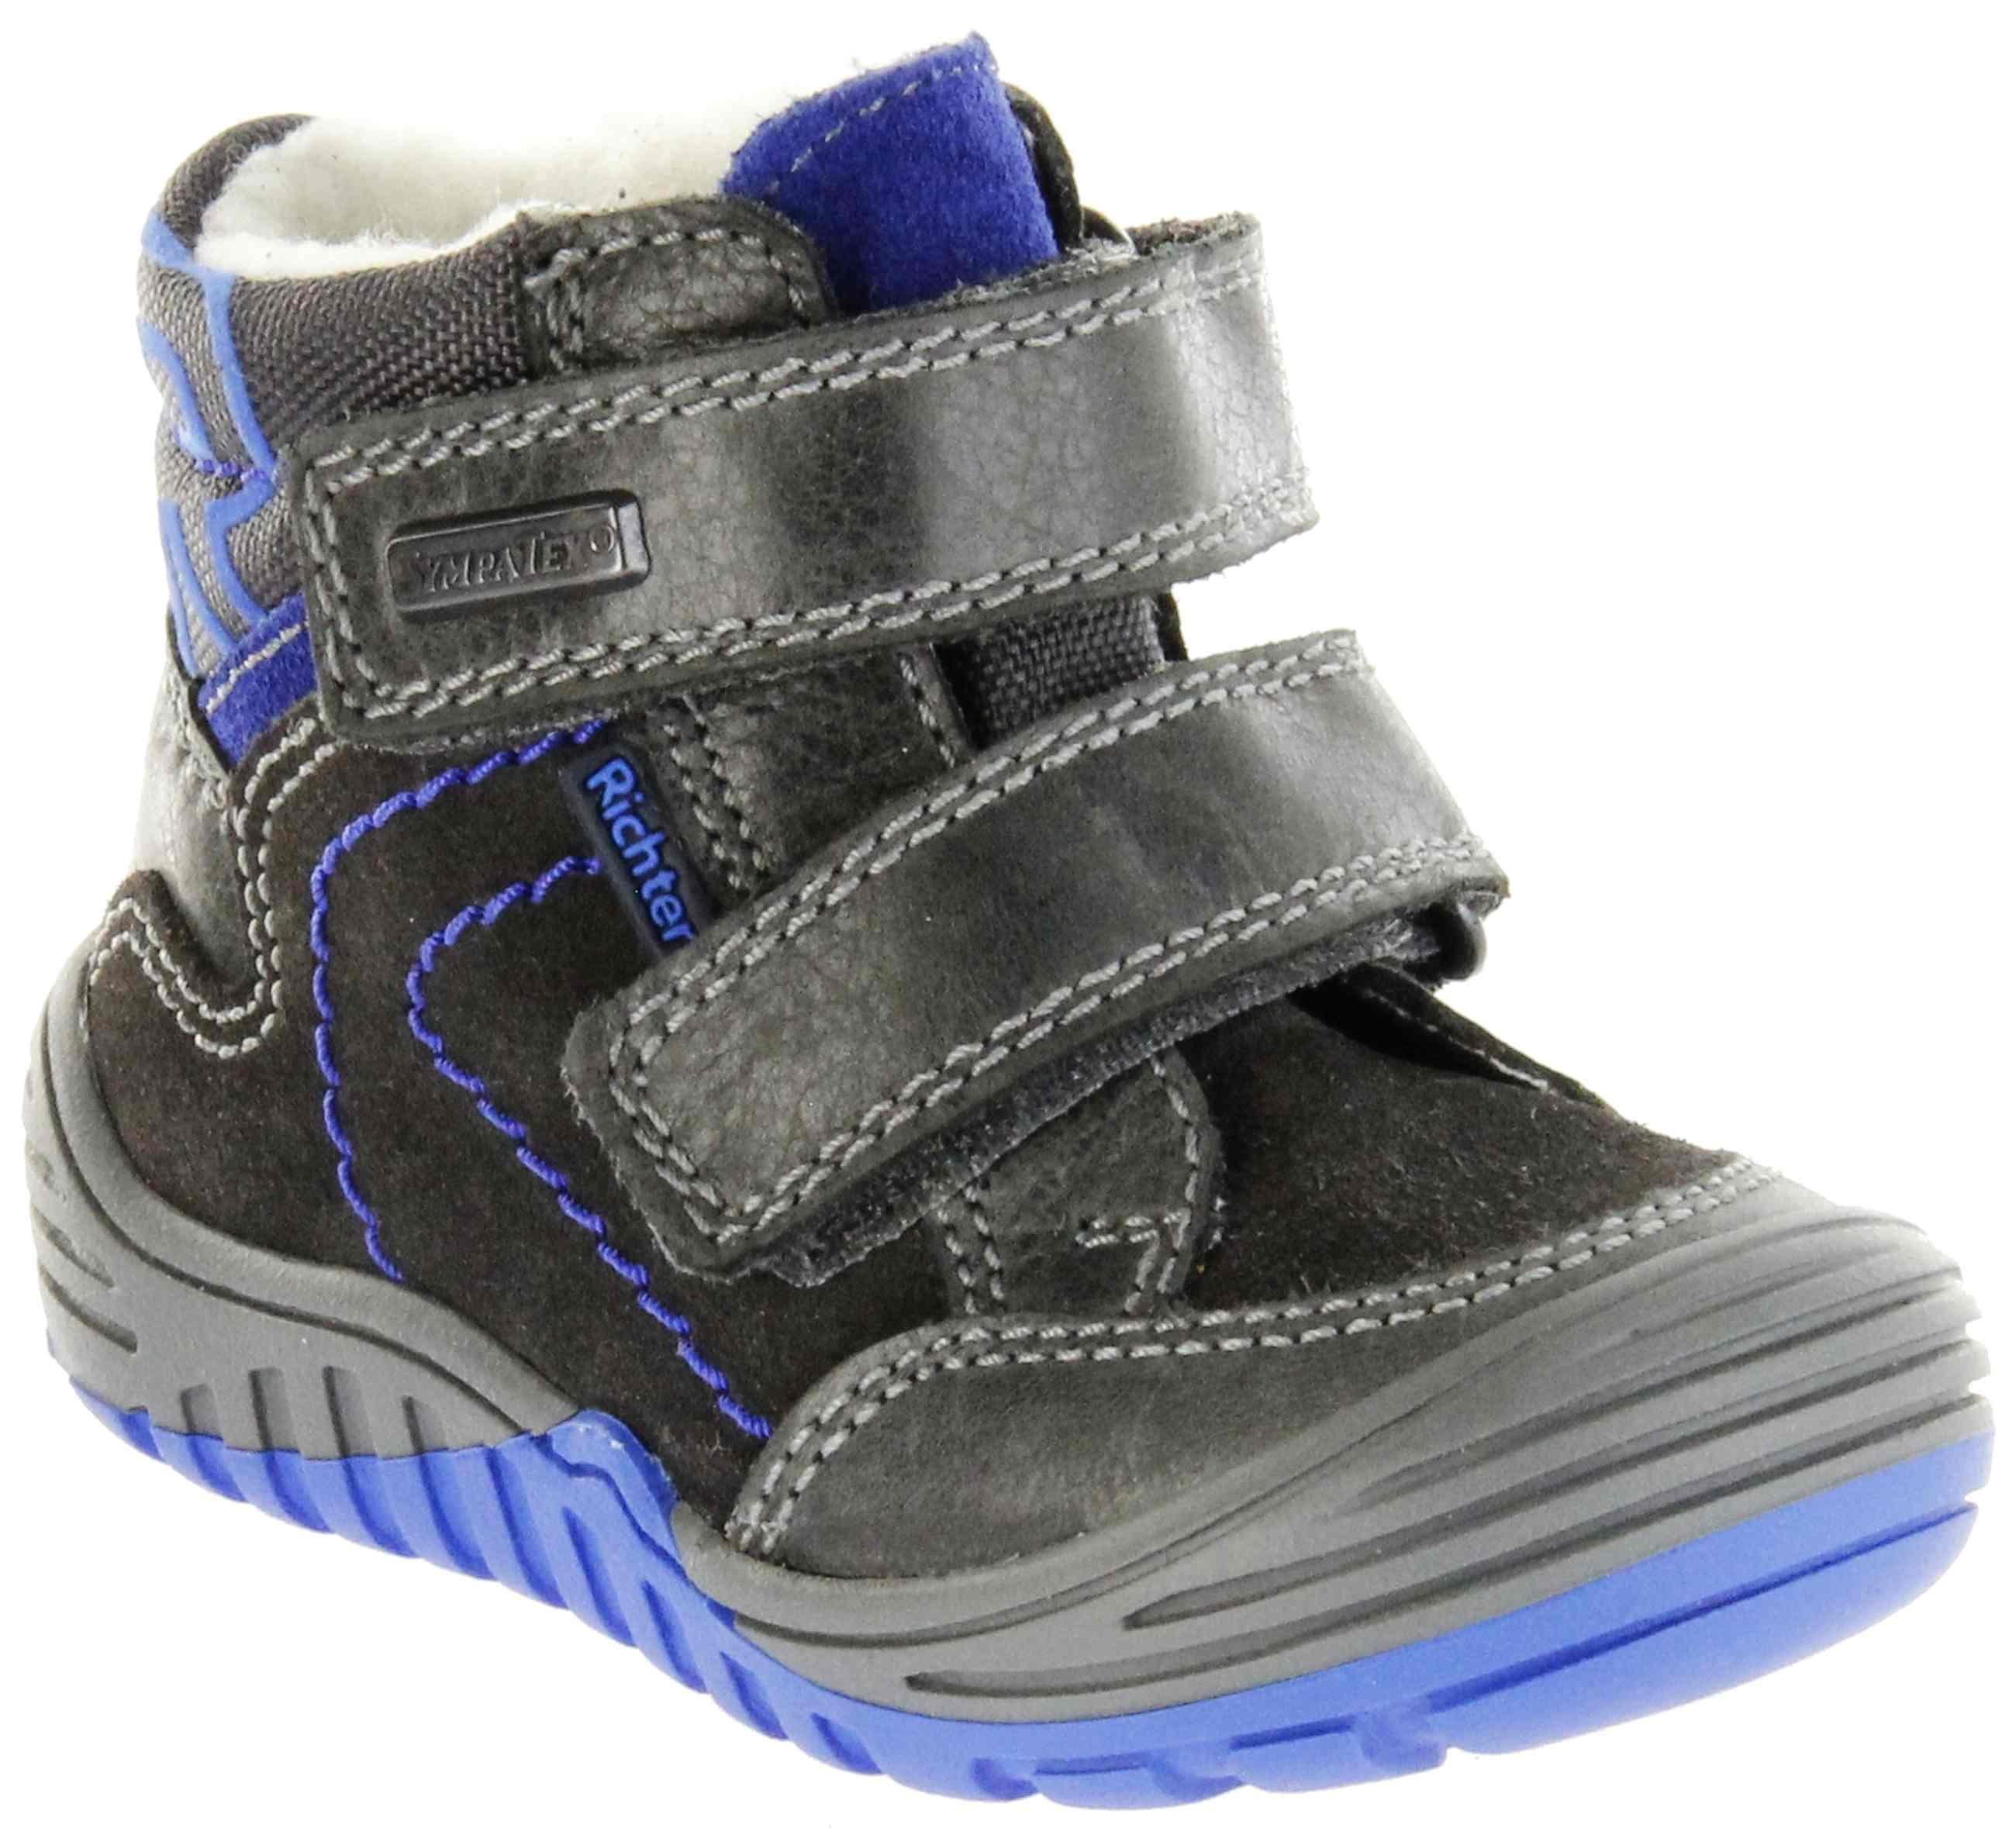 Richter fiú téli cipő 1031 441 6501 Téli cipők